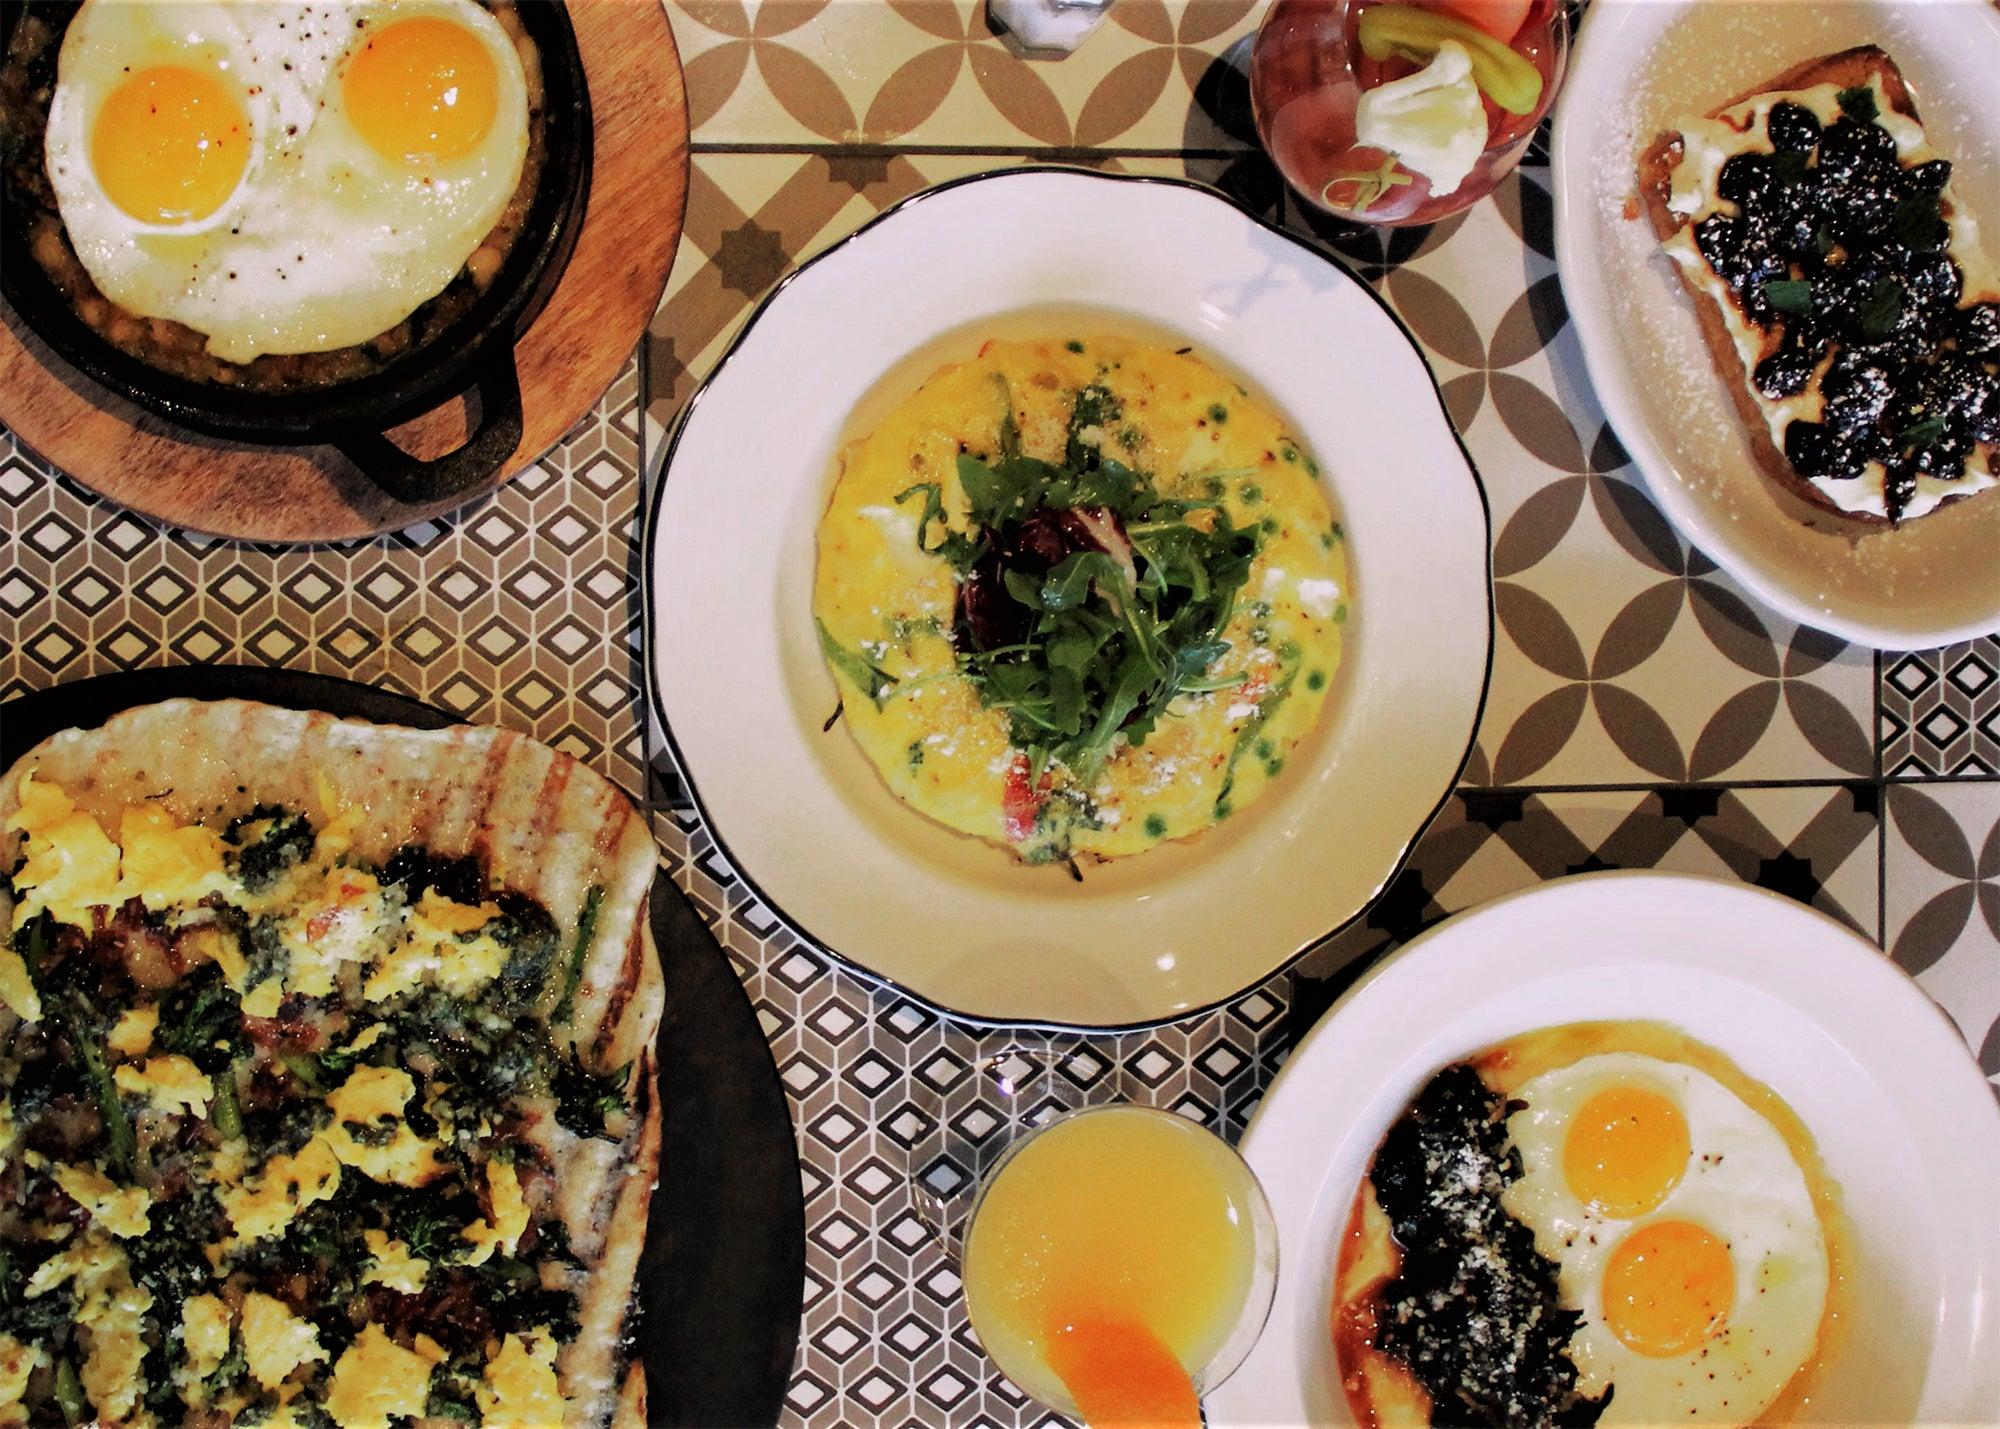 Breakfast table at Bar 'Cino